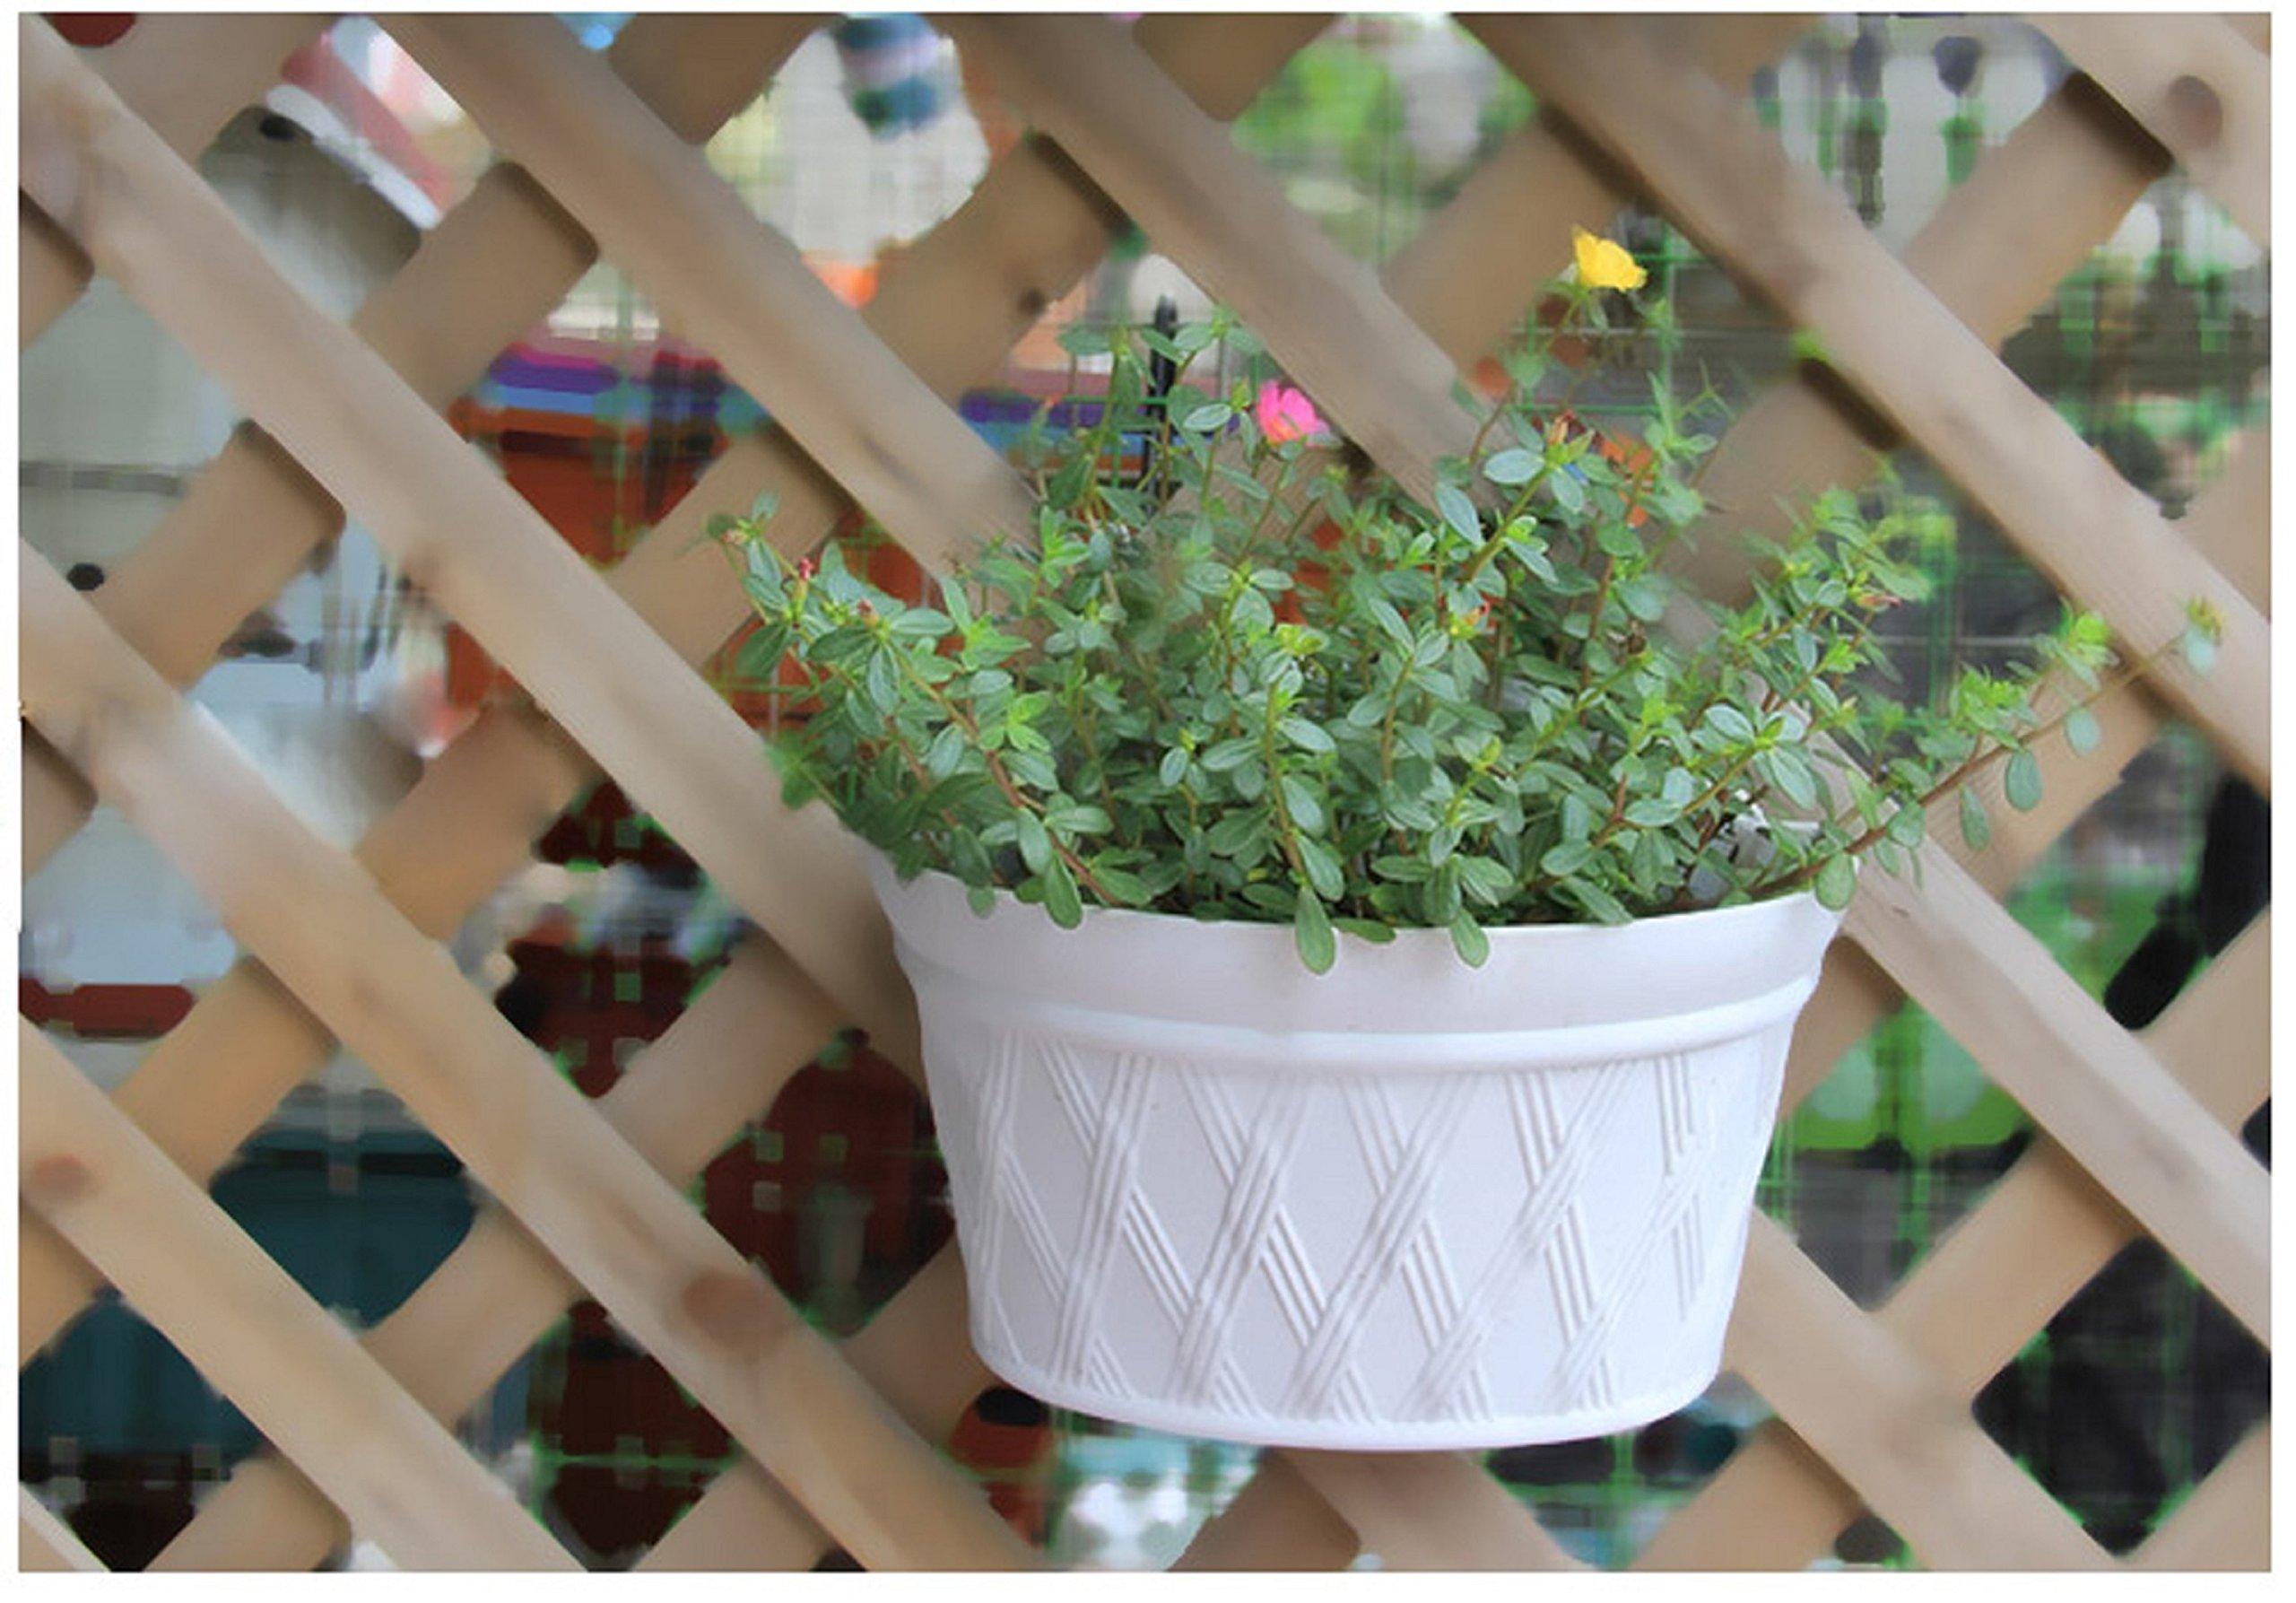 Mr.Garden 12 Inch Plastic Wall-Mounted Planter, 1pack (Light Grey)